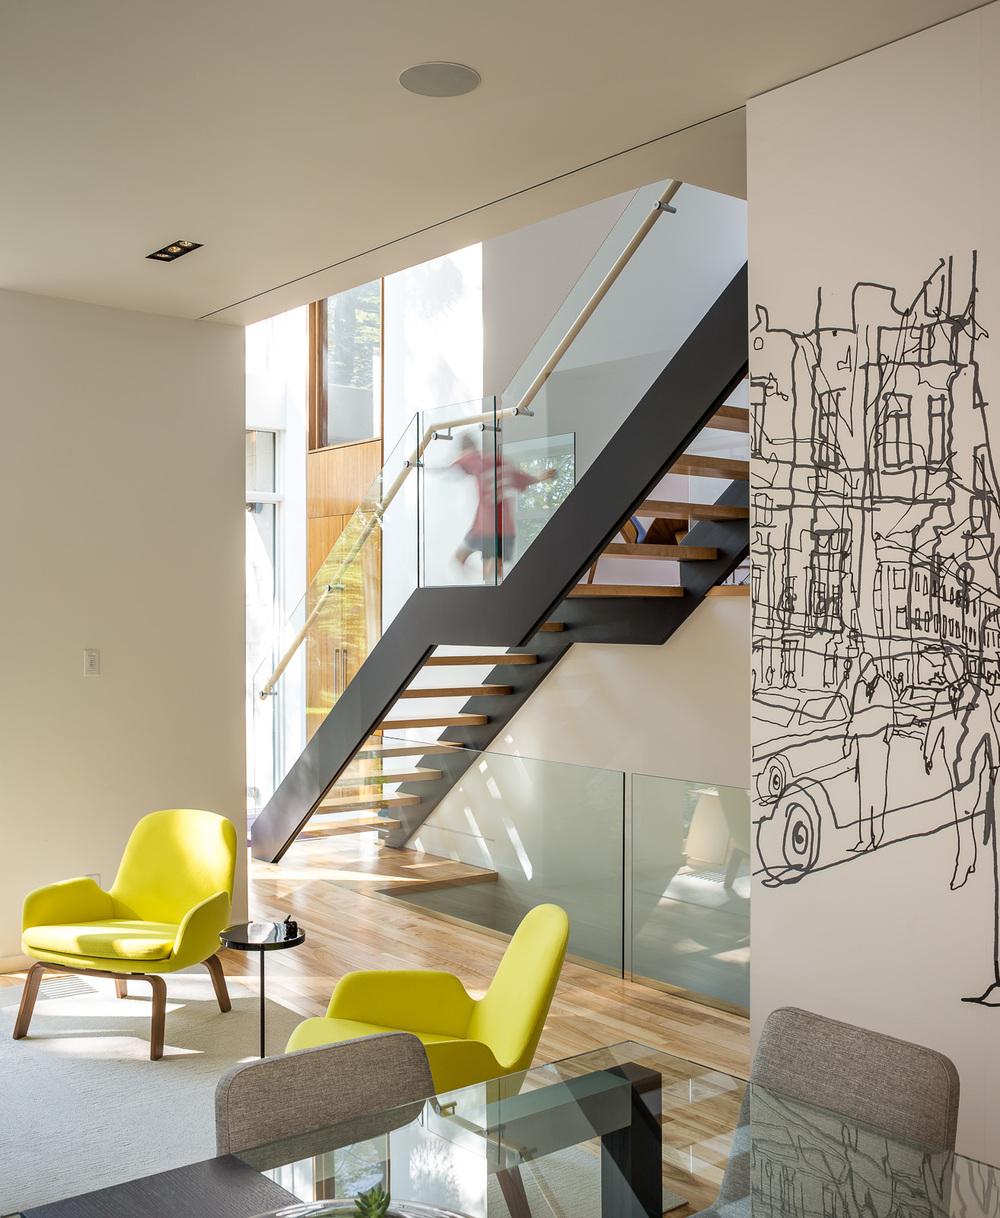 doublespace flynn avenue residence-0051-Edit-2.jpg